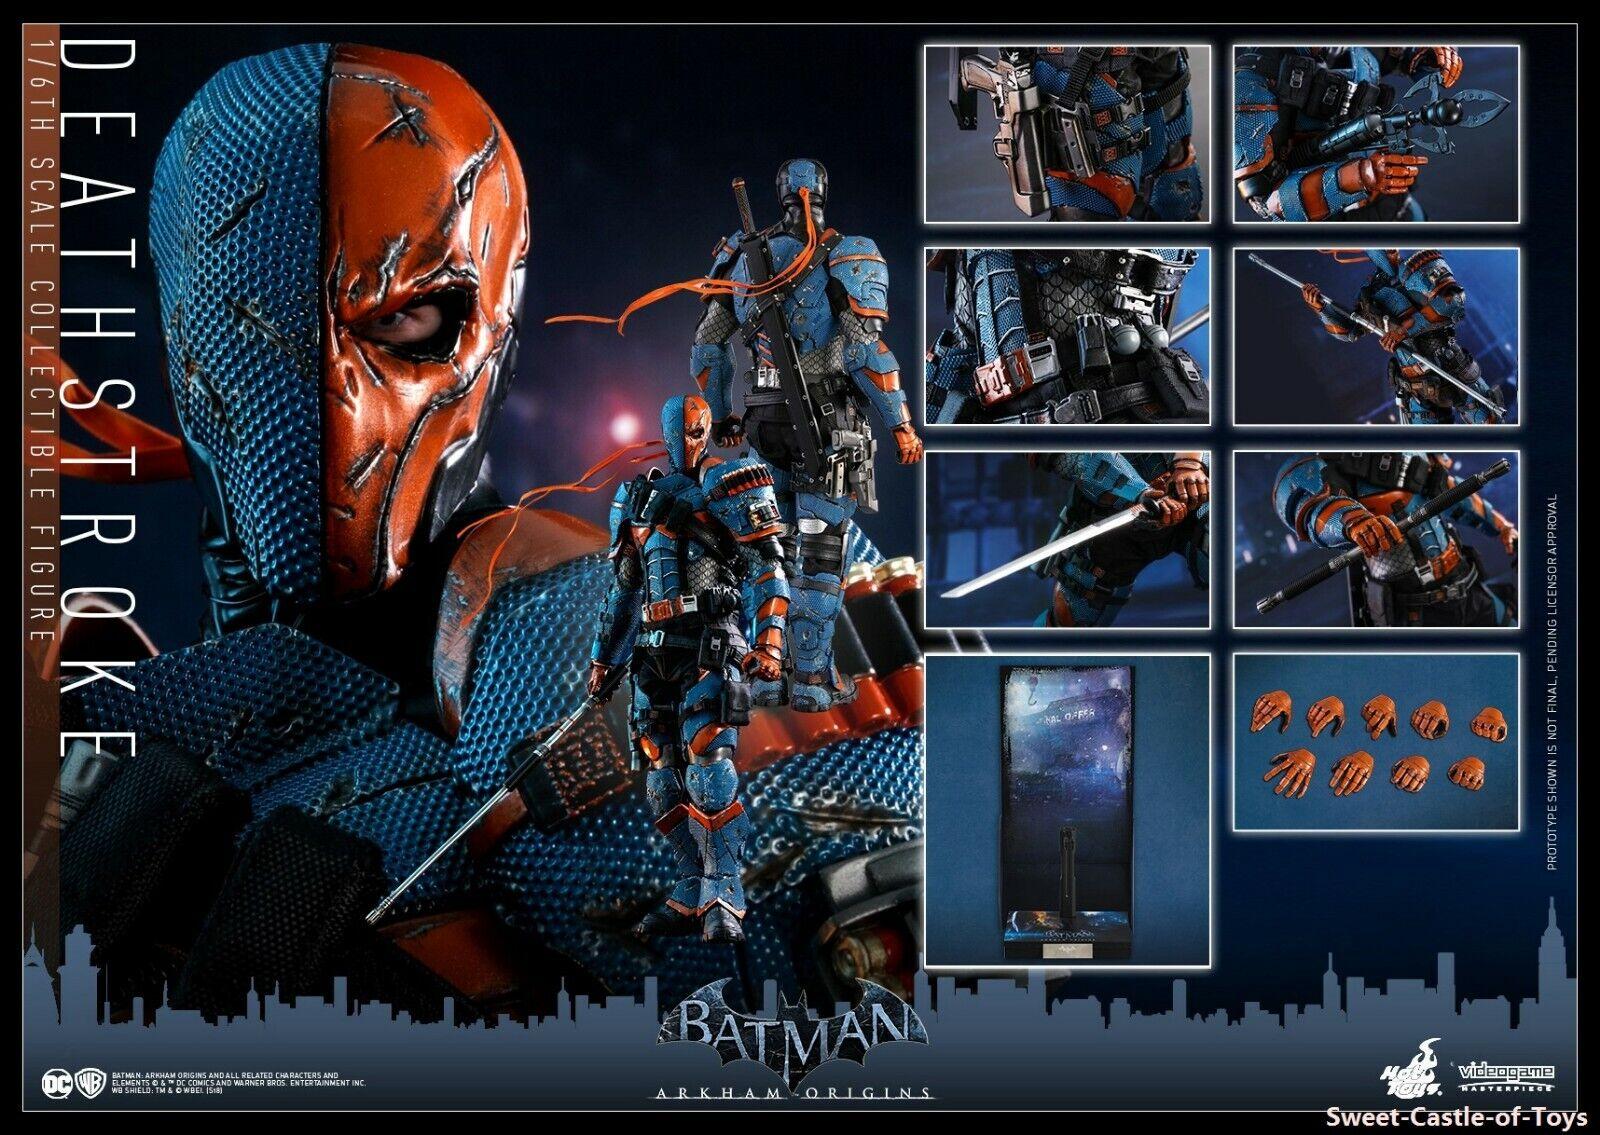 1 1 1 6 Hot Toys Action Figure DC Batman Arkham Oringis Deathstroke VGM30 In Stock caf